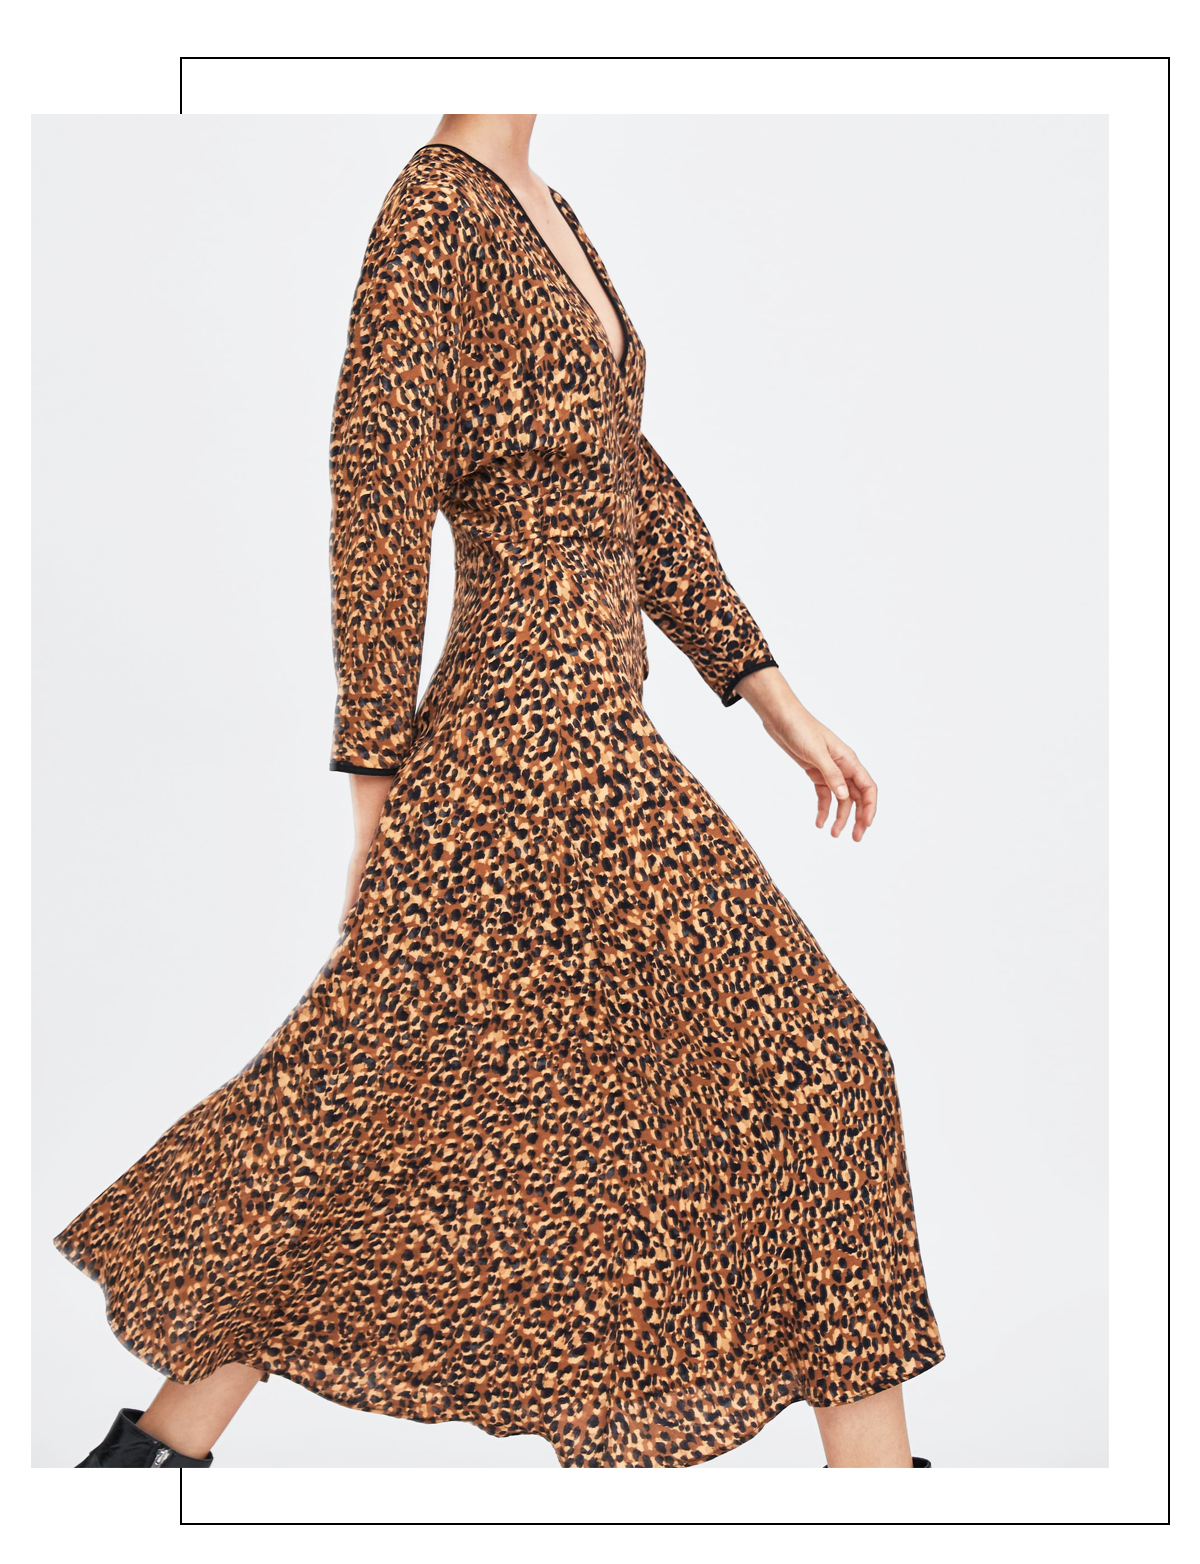 robe leopard tendance